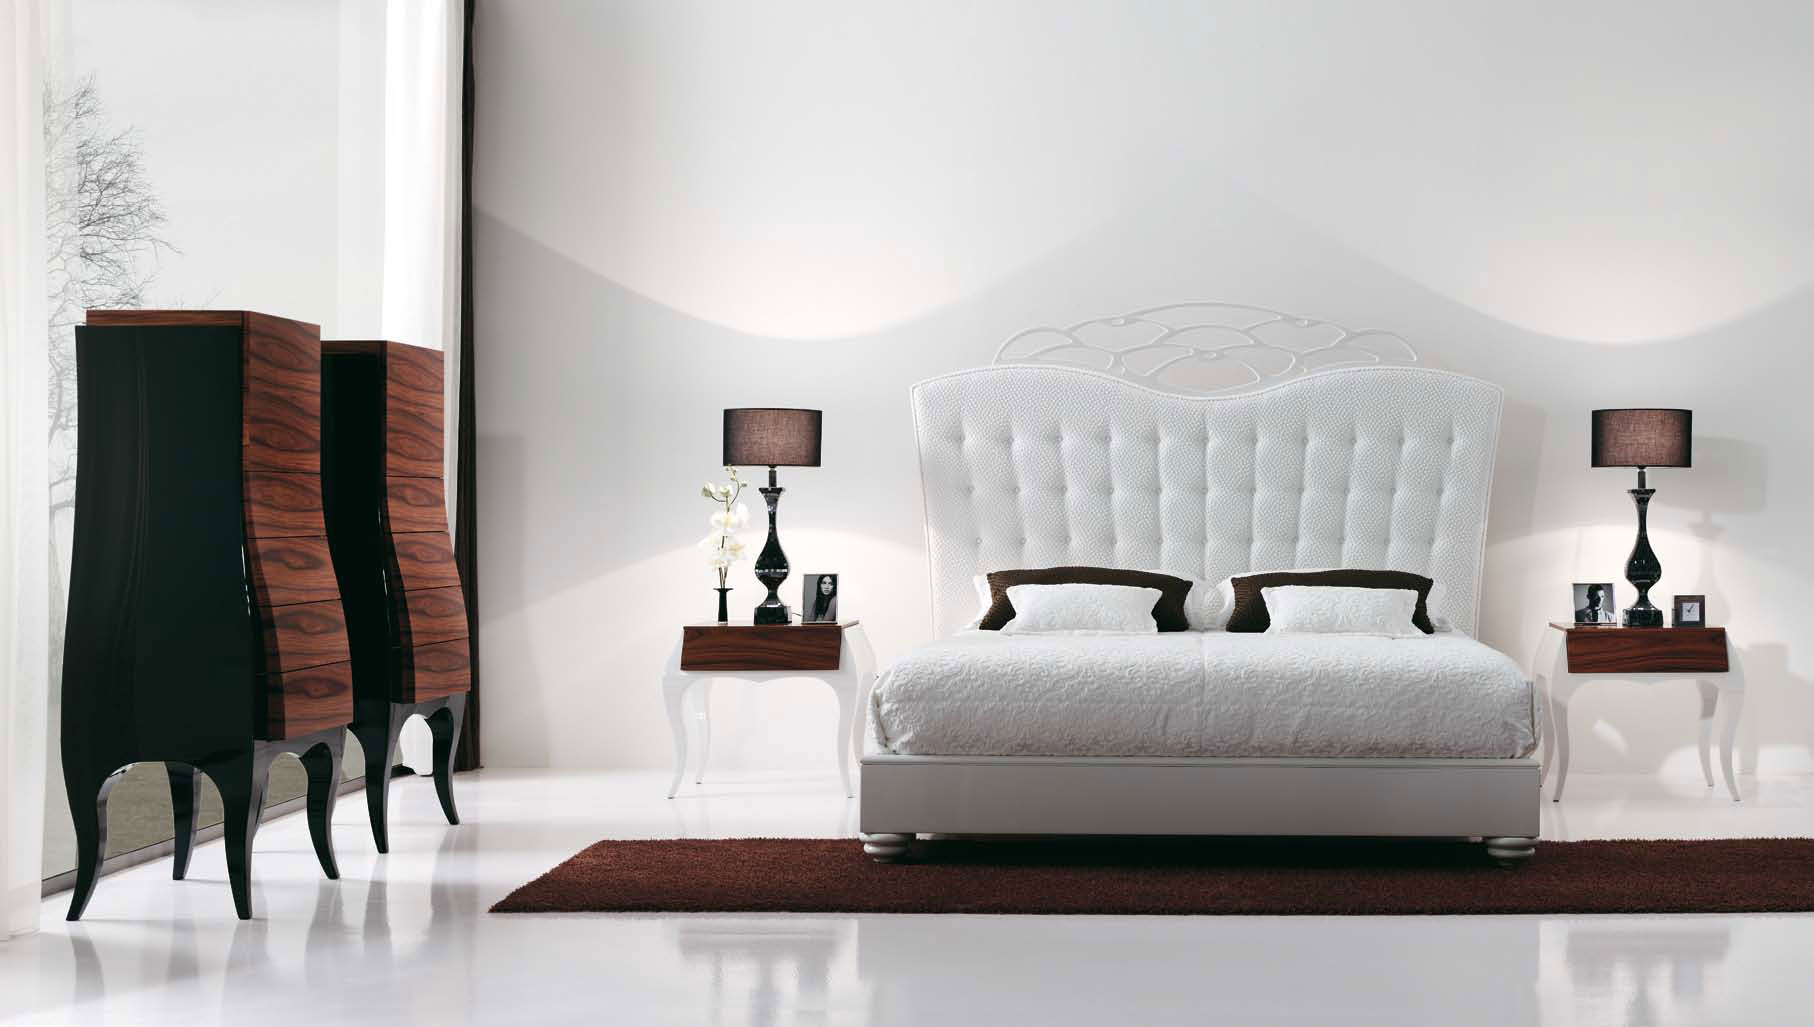 صور غرف نوم حديثه , احدث اشكال غرف النوم